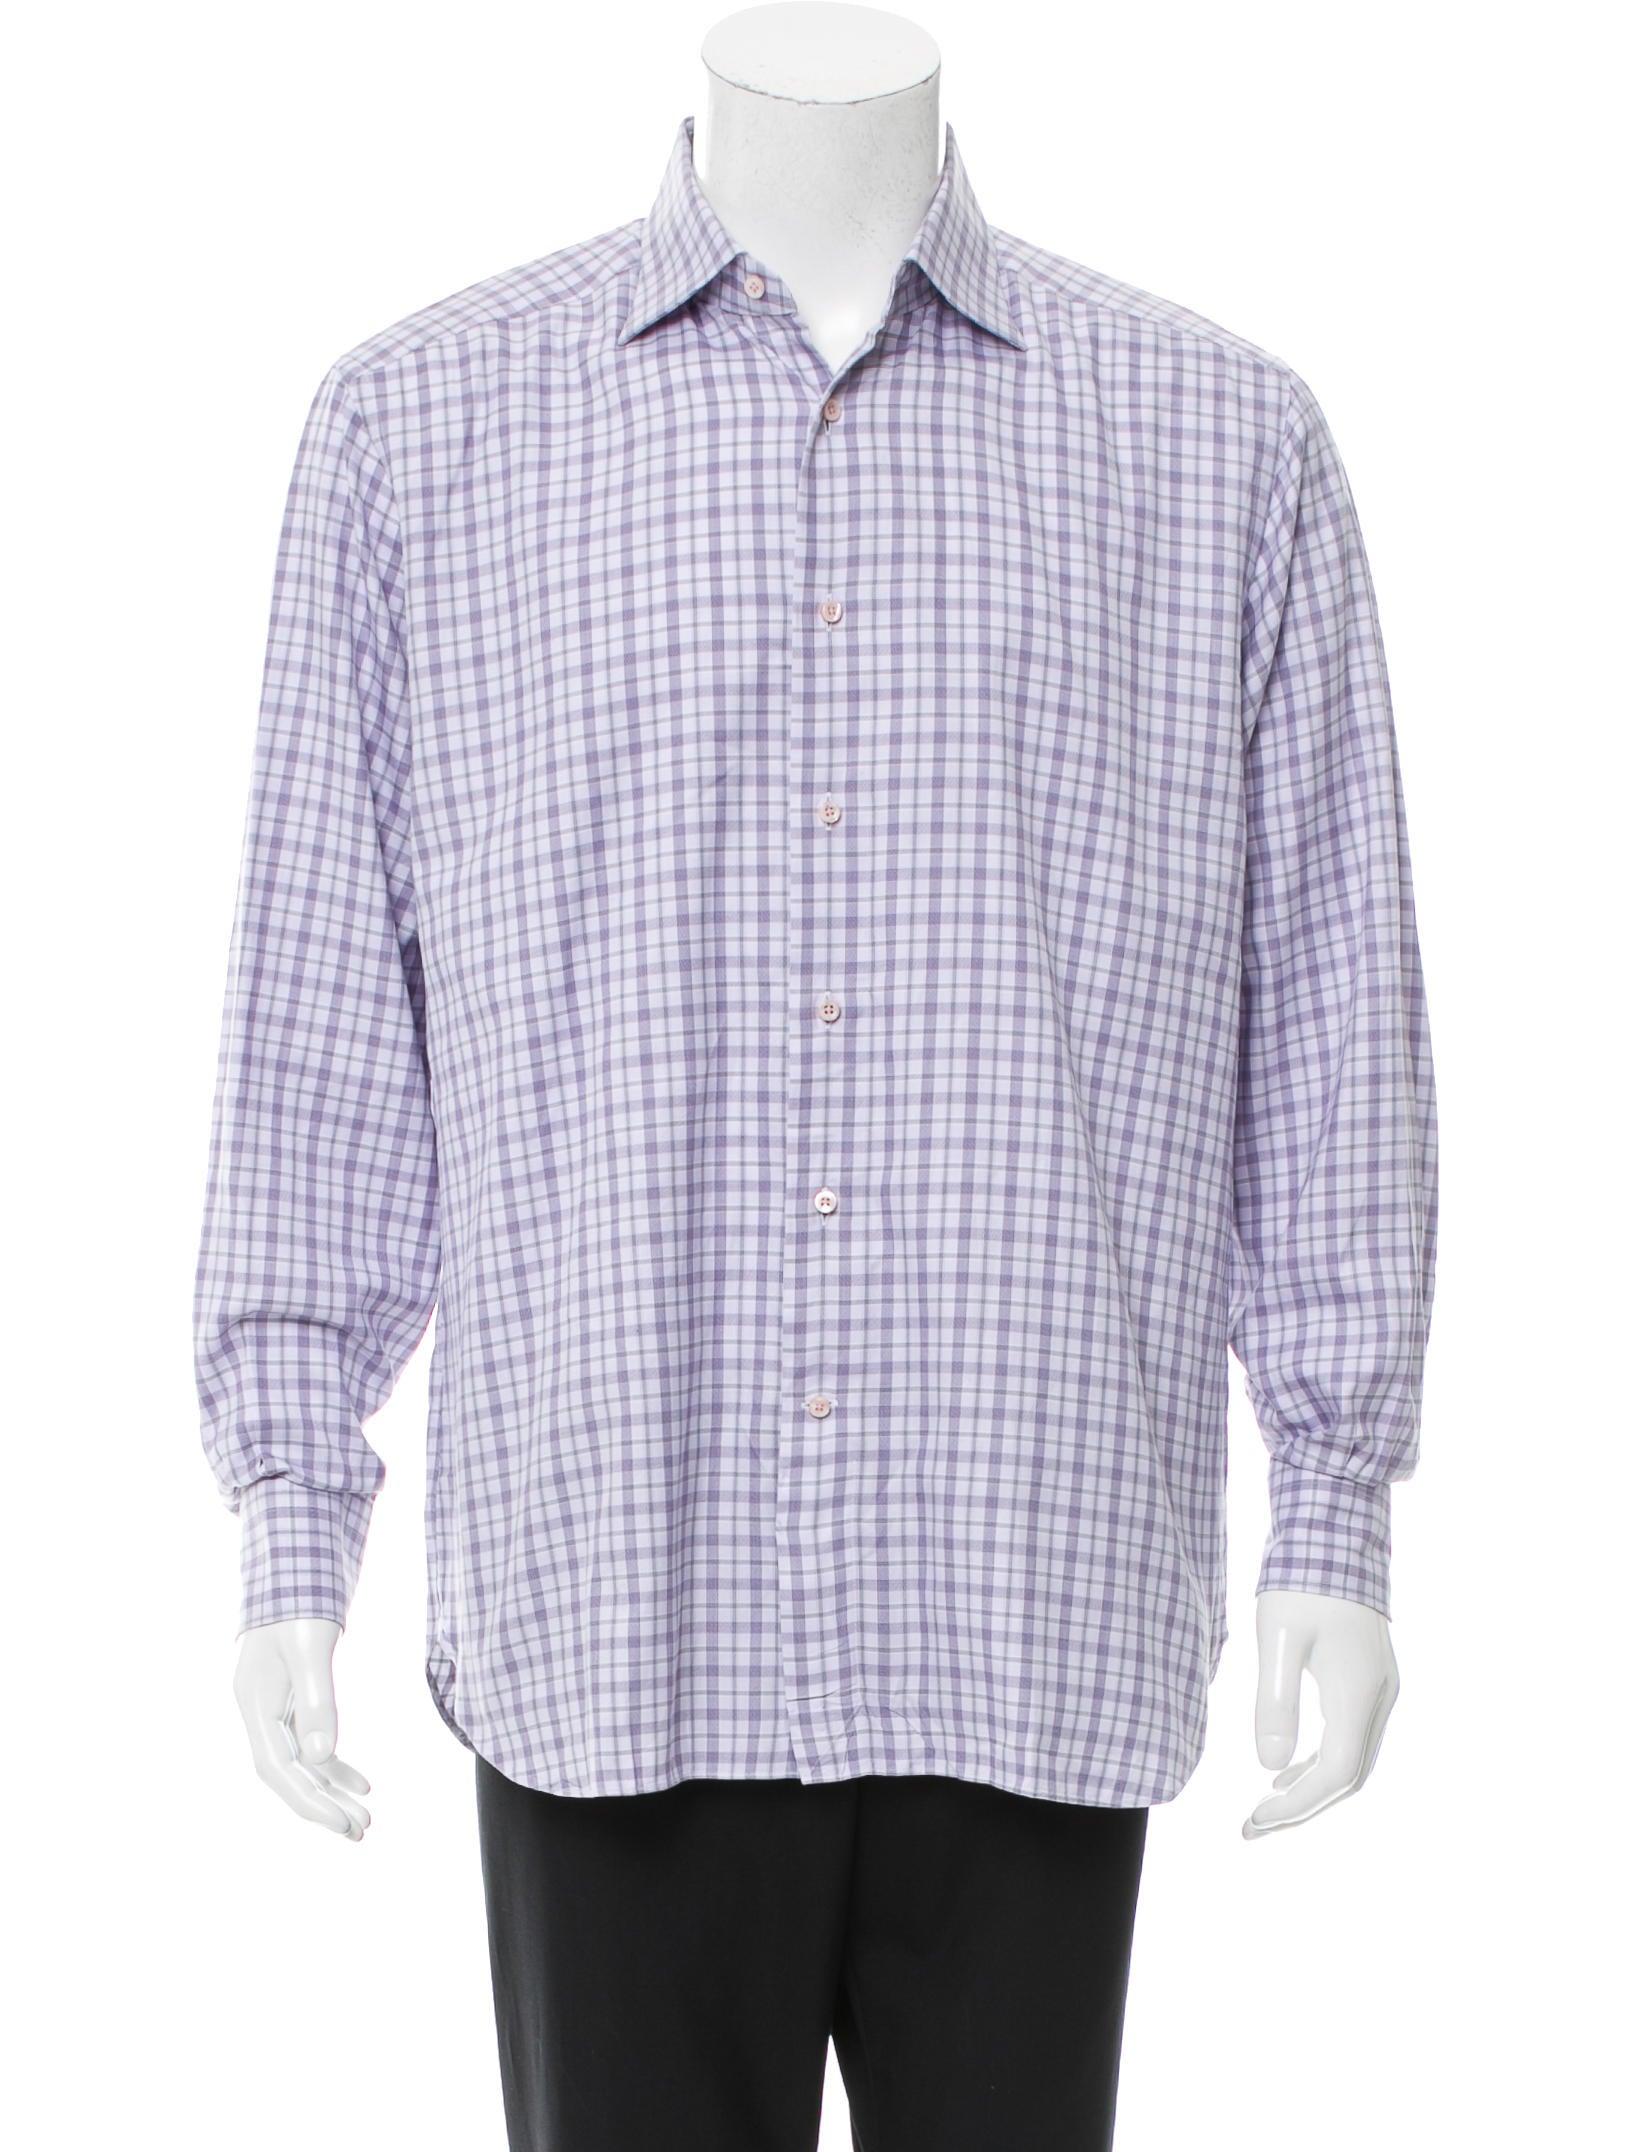 ermenegildo zegna plaid button up shirt clothing zgn24746 the realreal. Black Bedroom Furniture Sets. Home Design Ideas